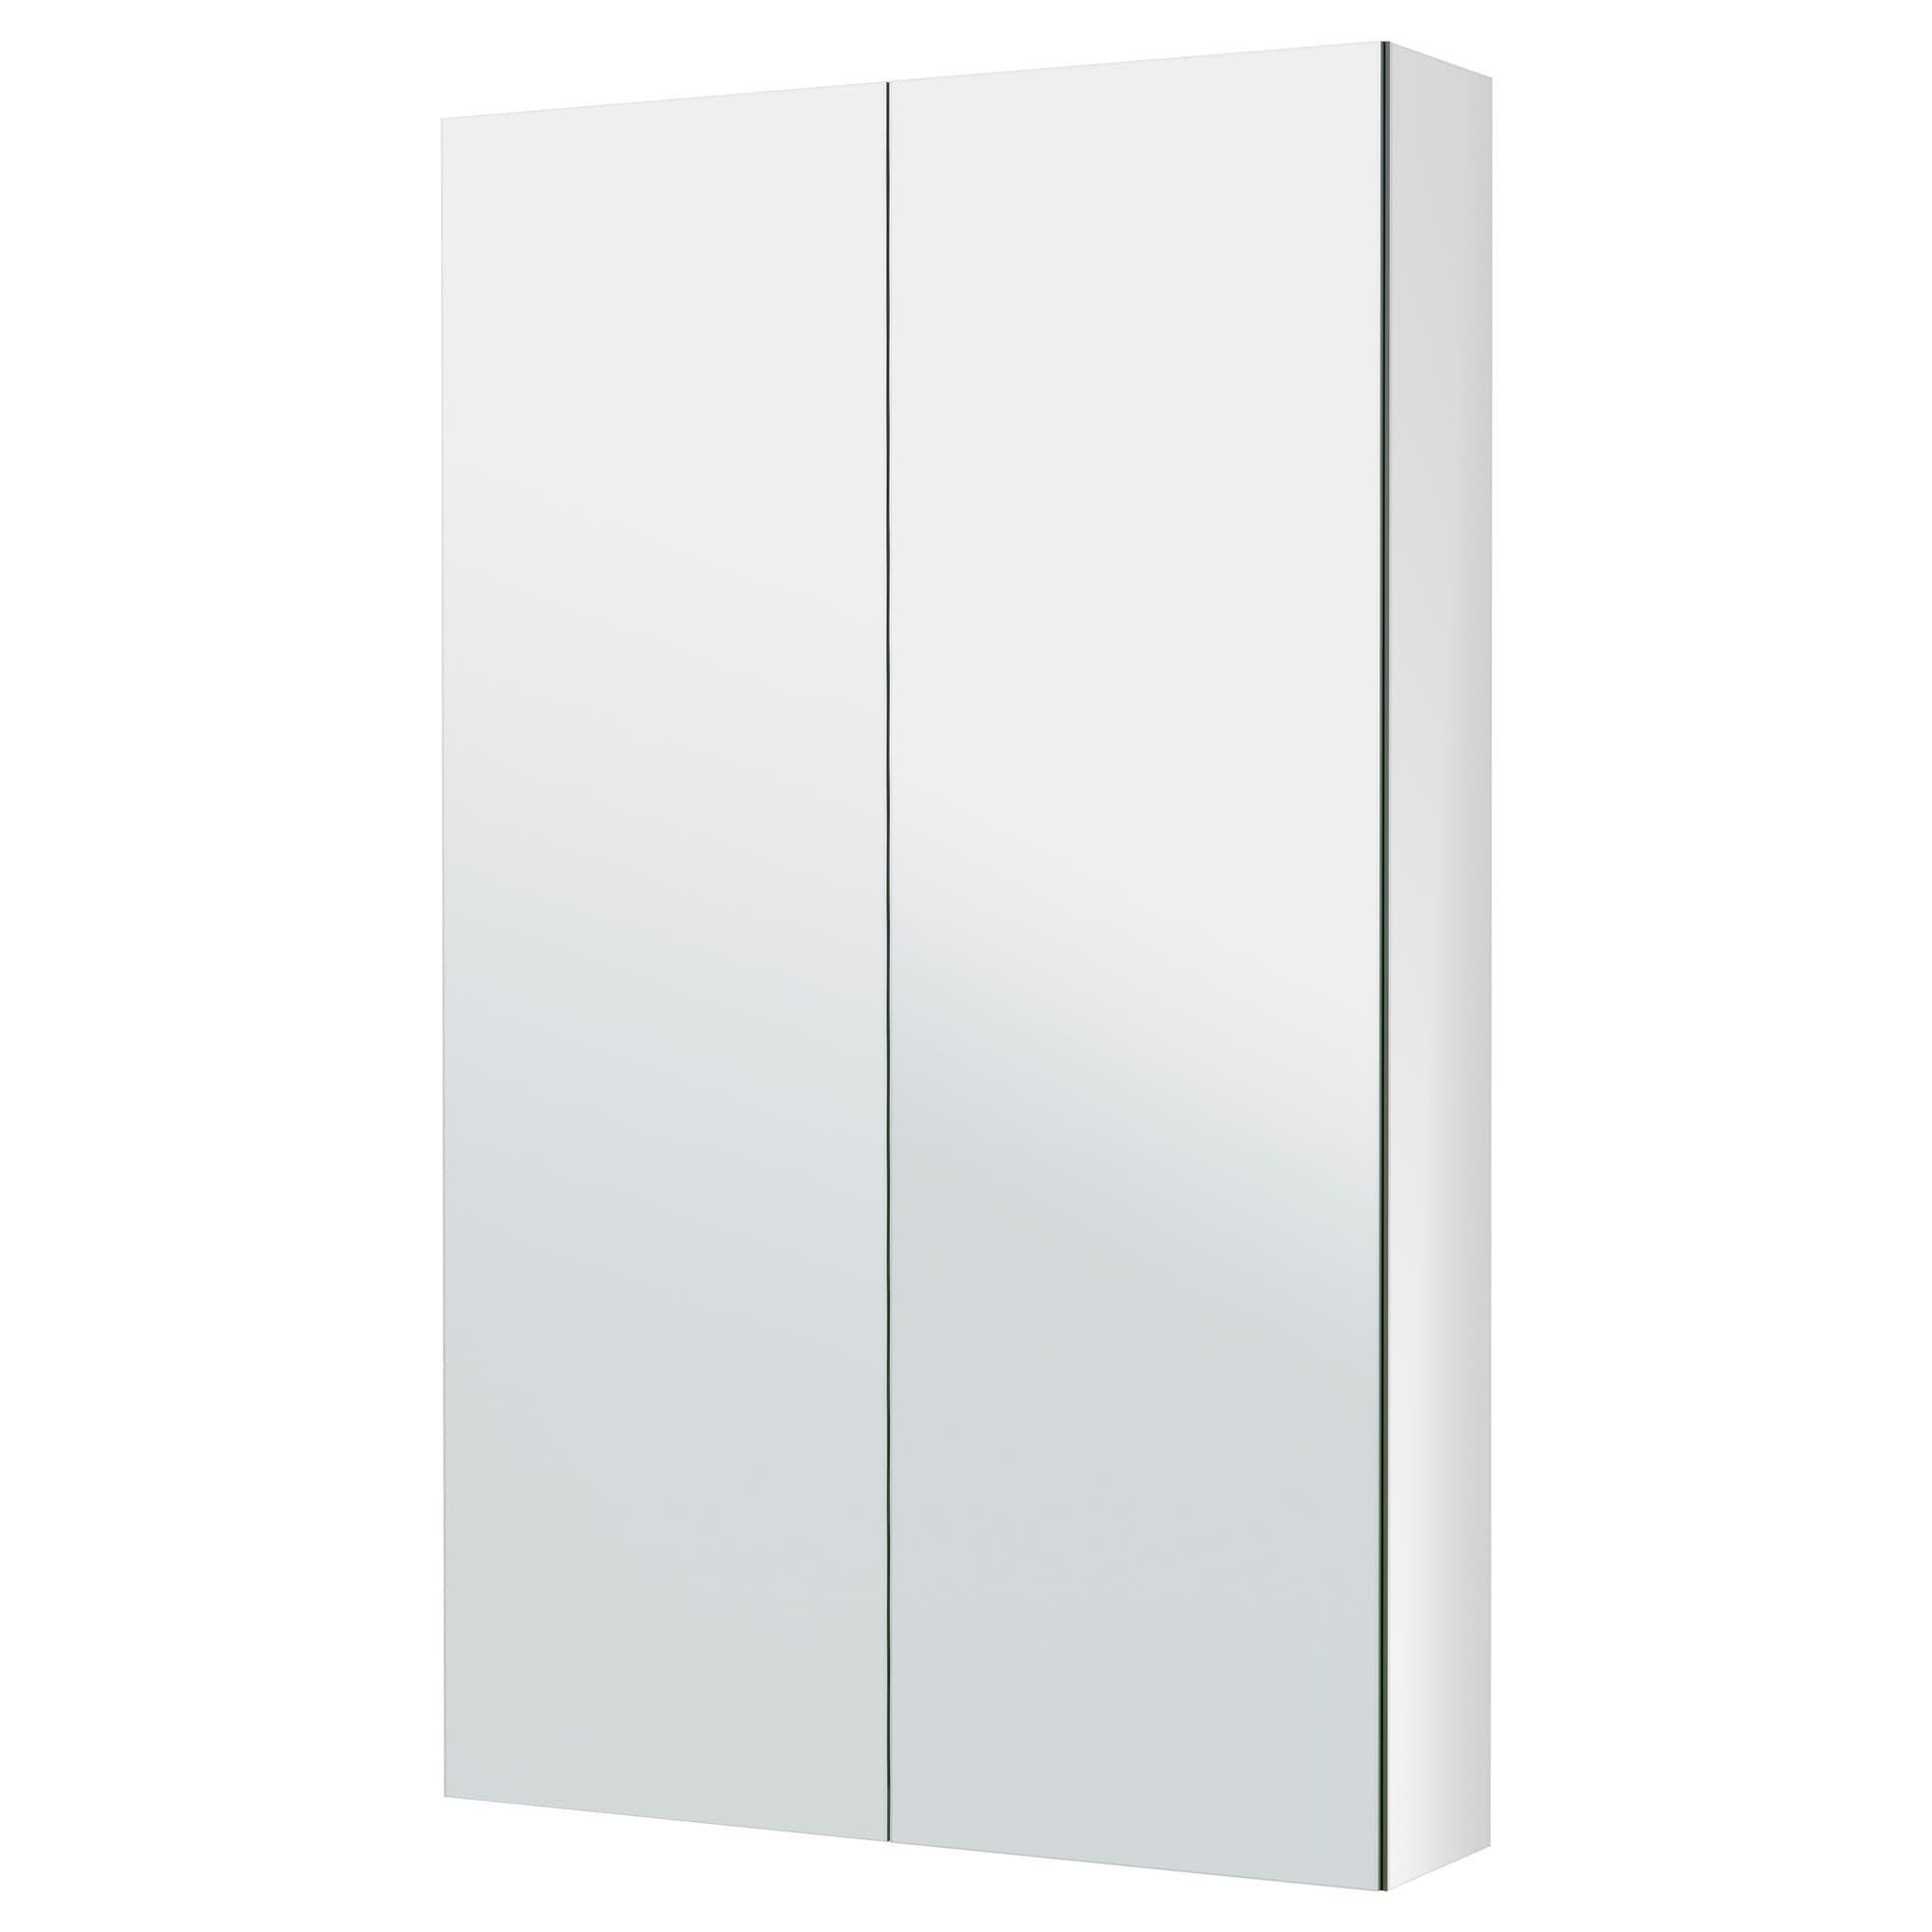 Godmorgon Mirror Cabinet With 2 Doors 23 5 8x5 1 2x37 3 4 Ikea Cabinets Bathroom Storage